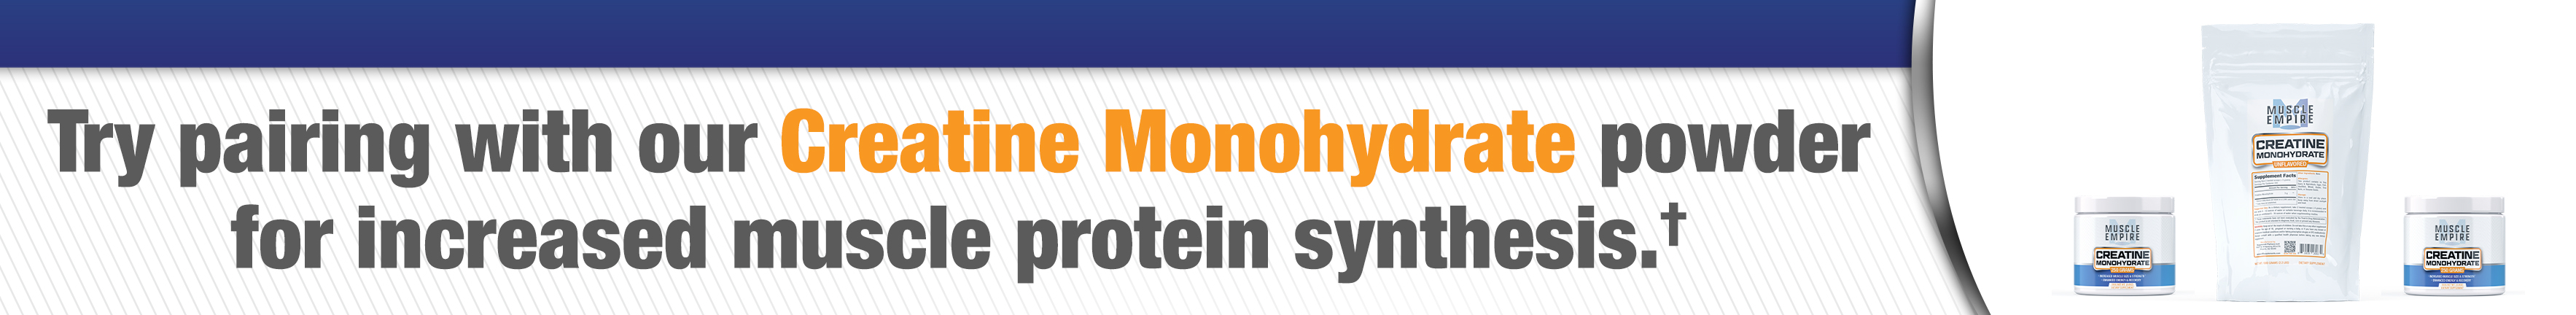 creatine-monohydrate-consider-10-21.jpg